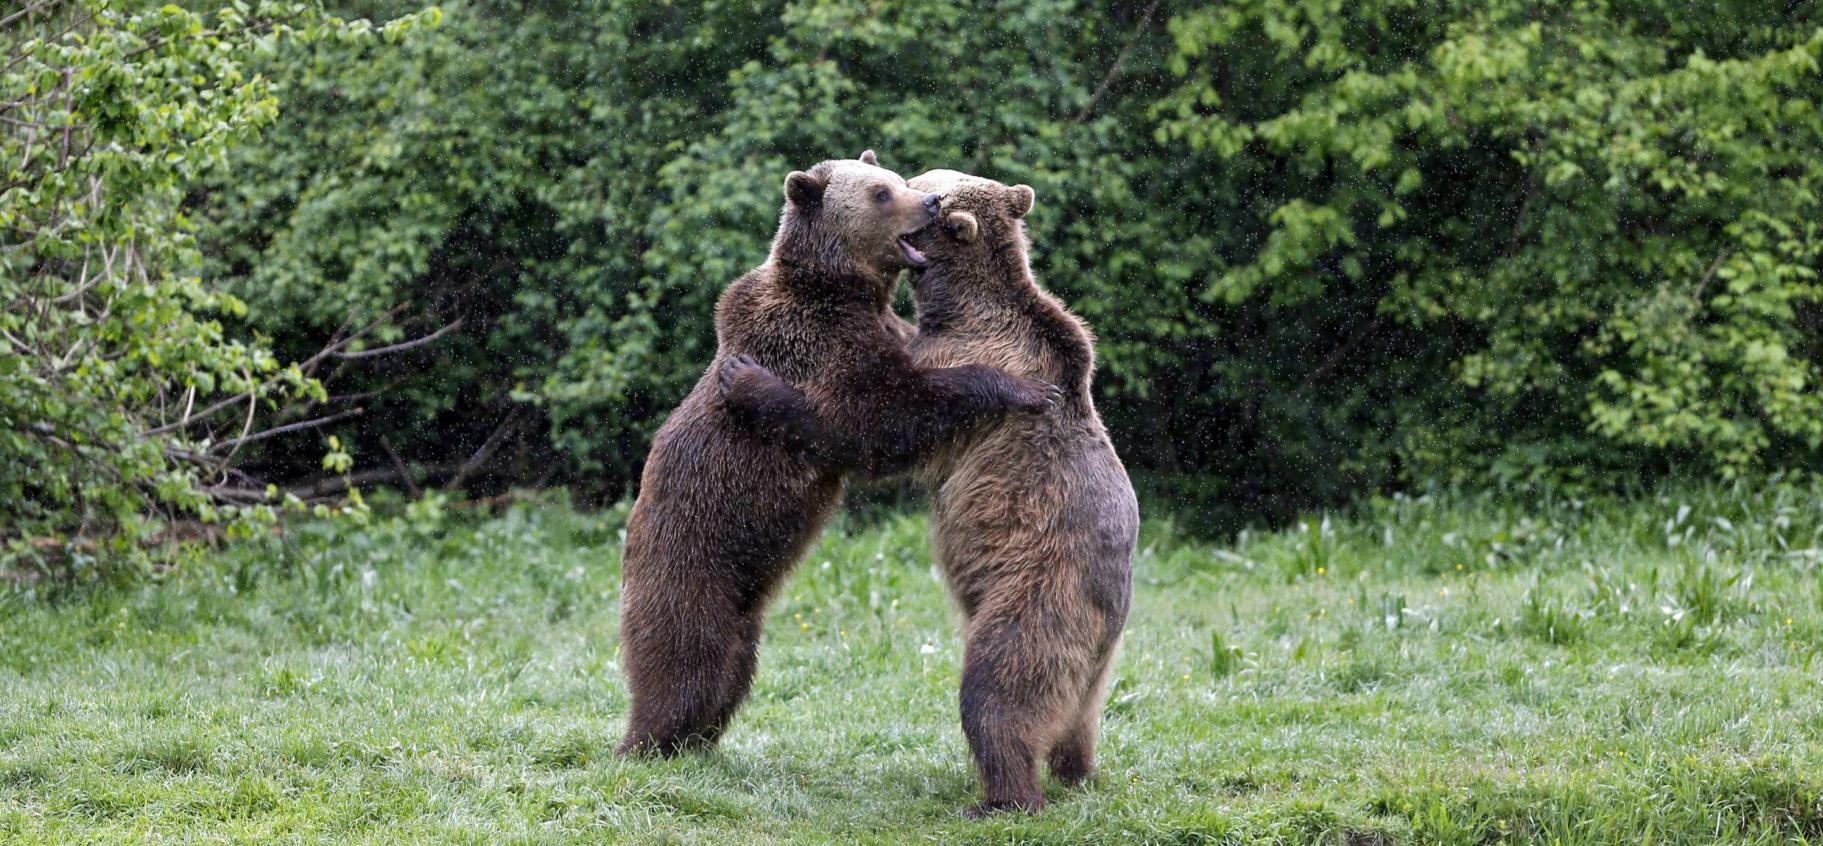 Un couple d'ours croates adepte de la fellation